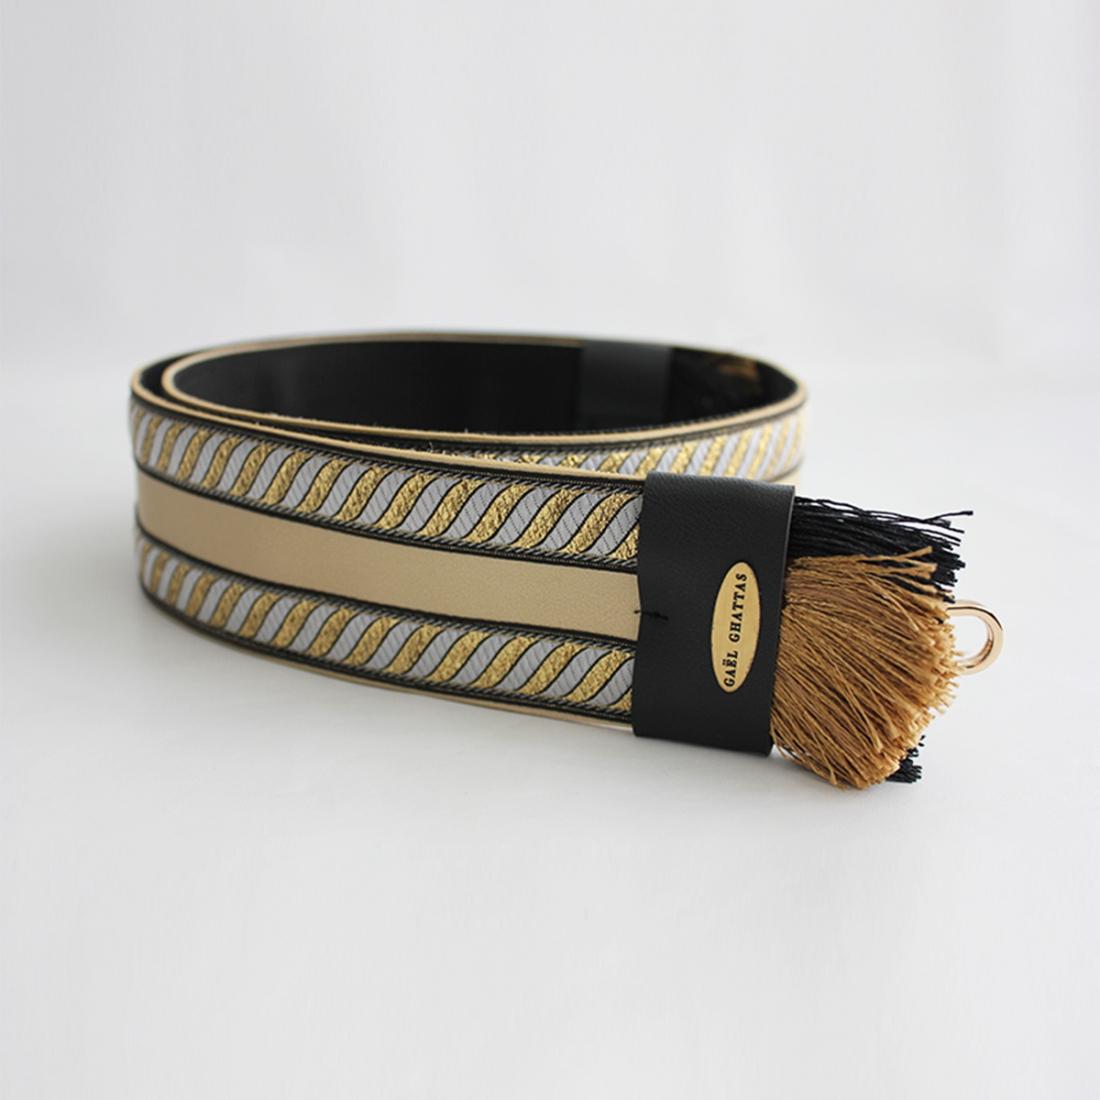 BOHO Ethnic Fabric Crossbody BAG STRAP